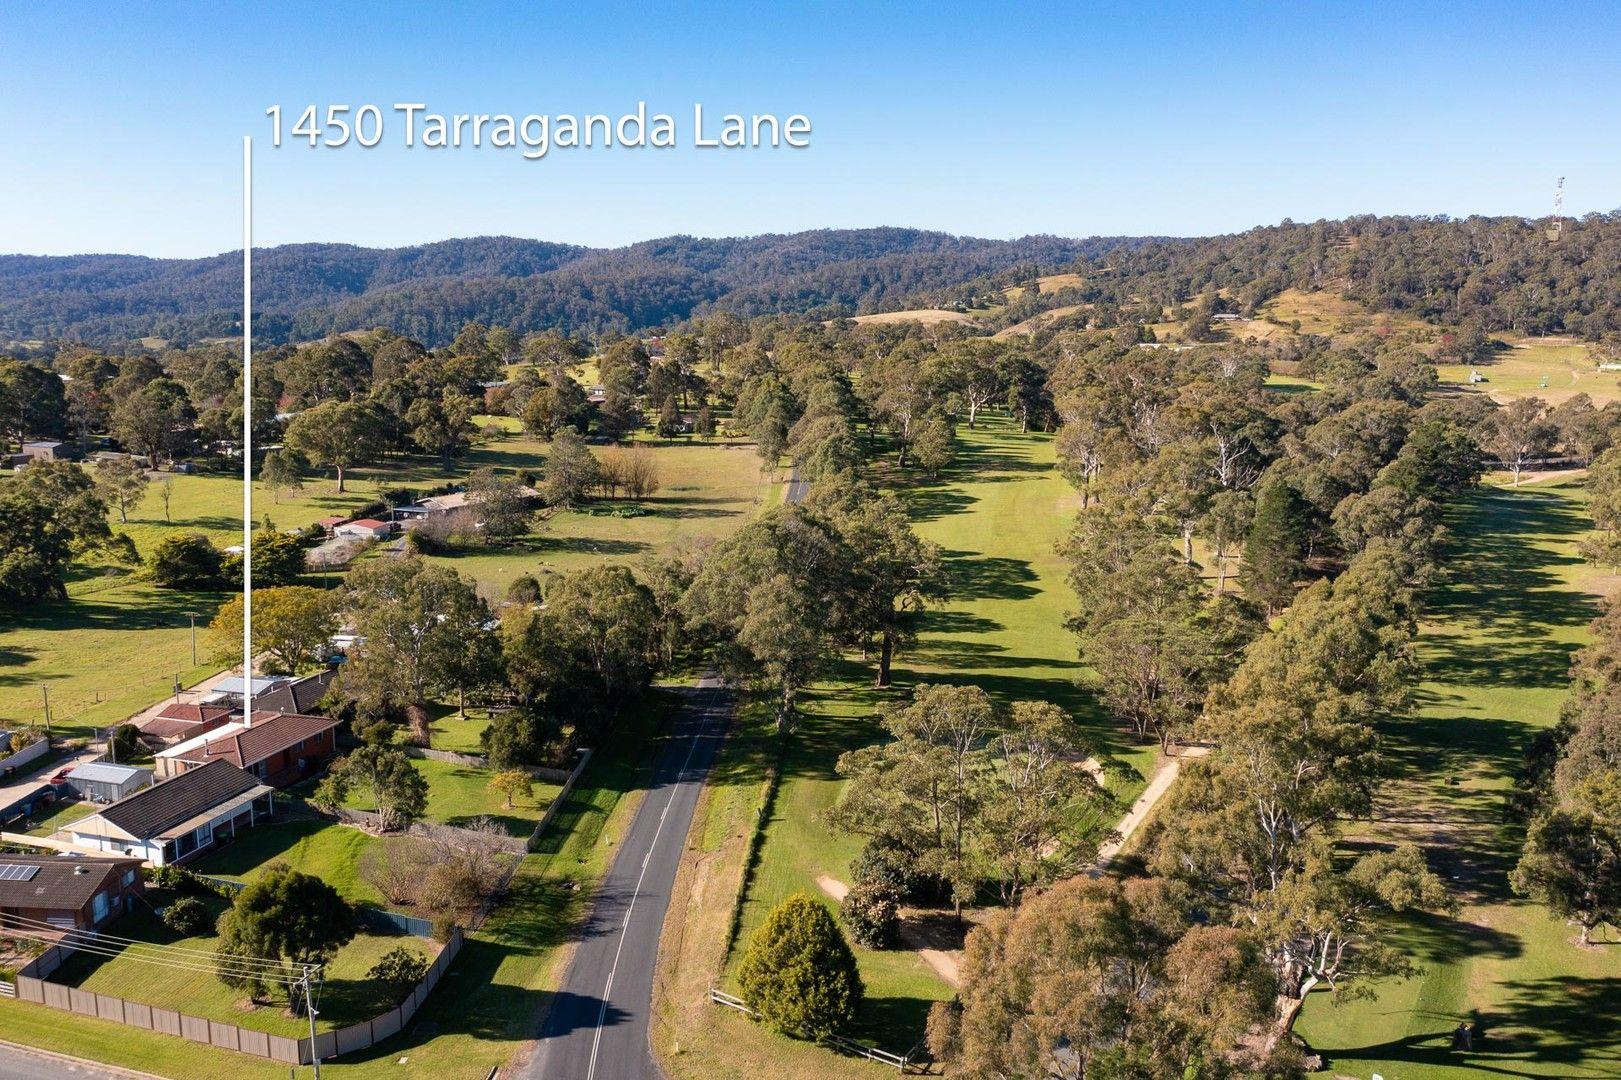 1450 Tarraganda Lane, Tarraganda NSW 2550, Image 0